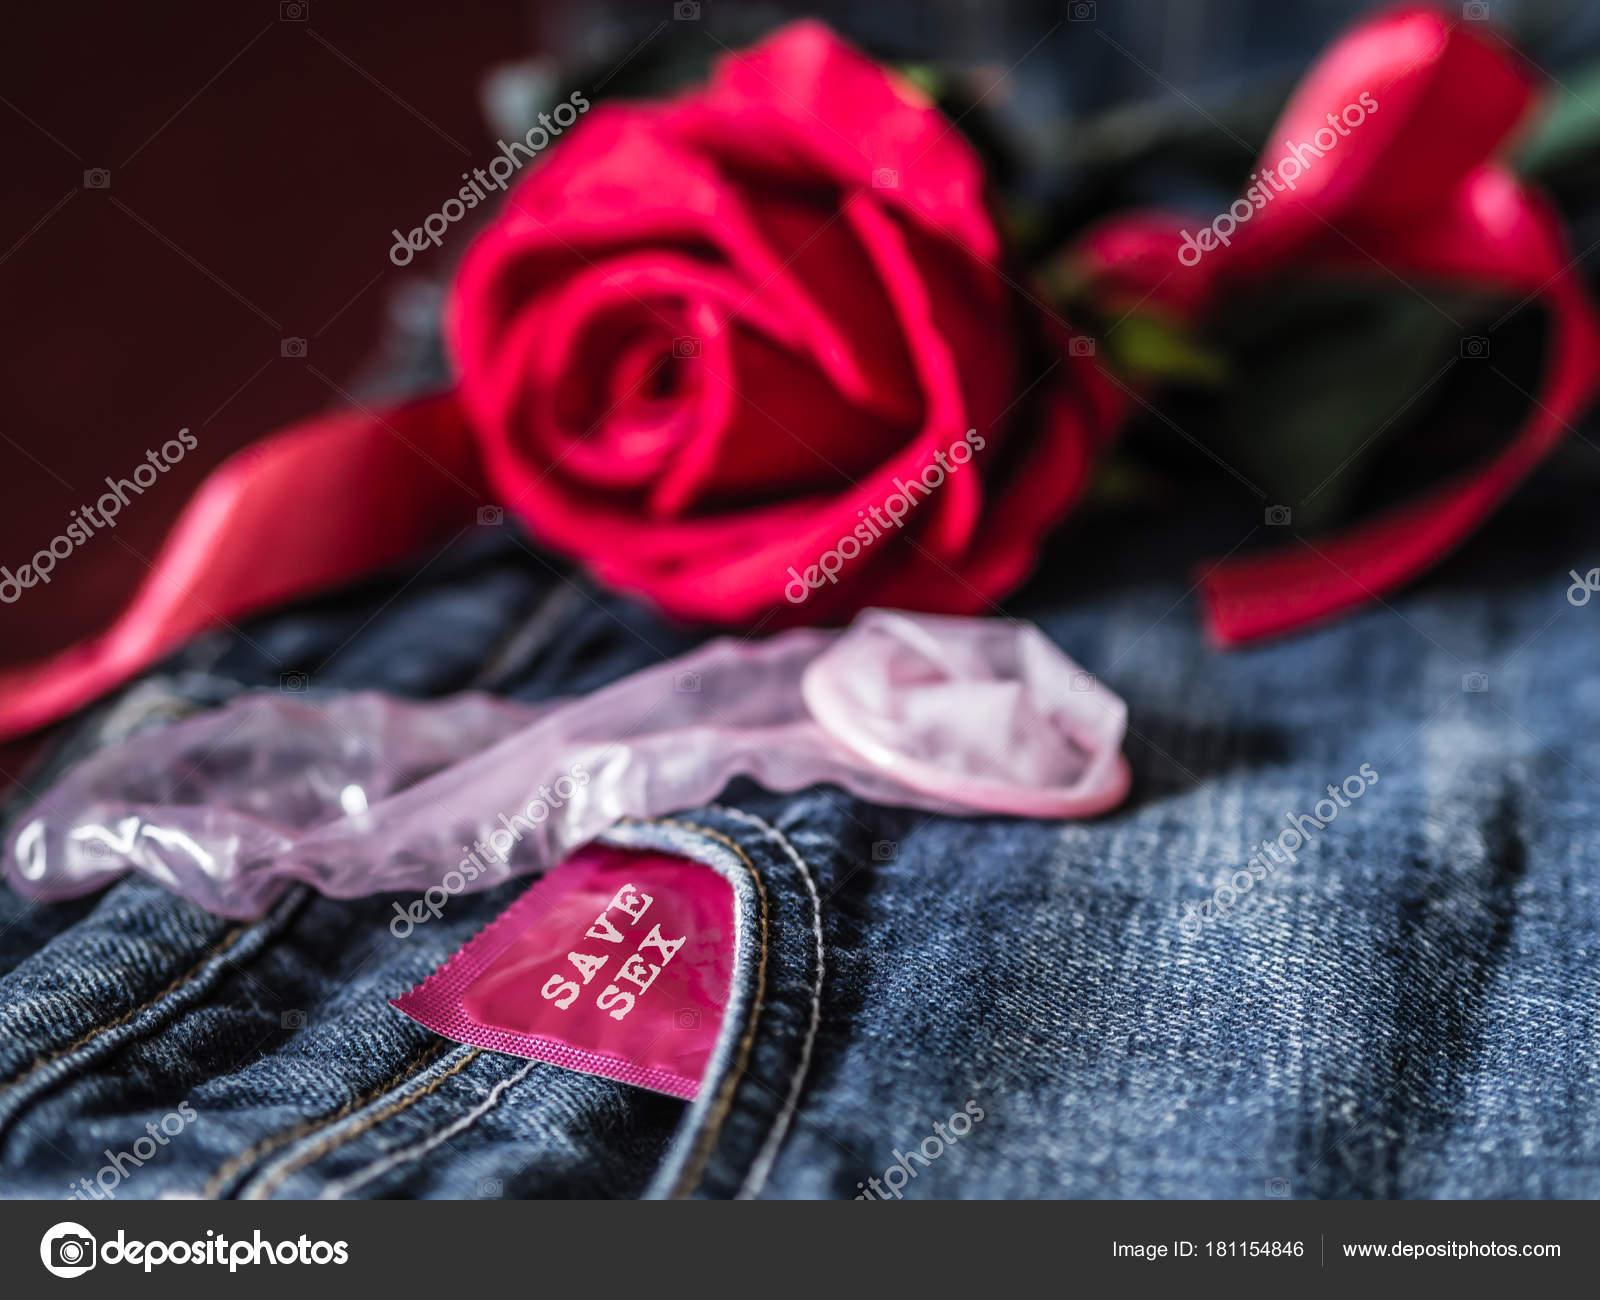 Ftv girls pink dress